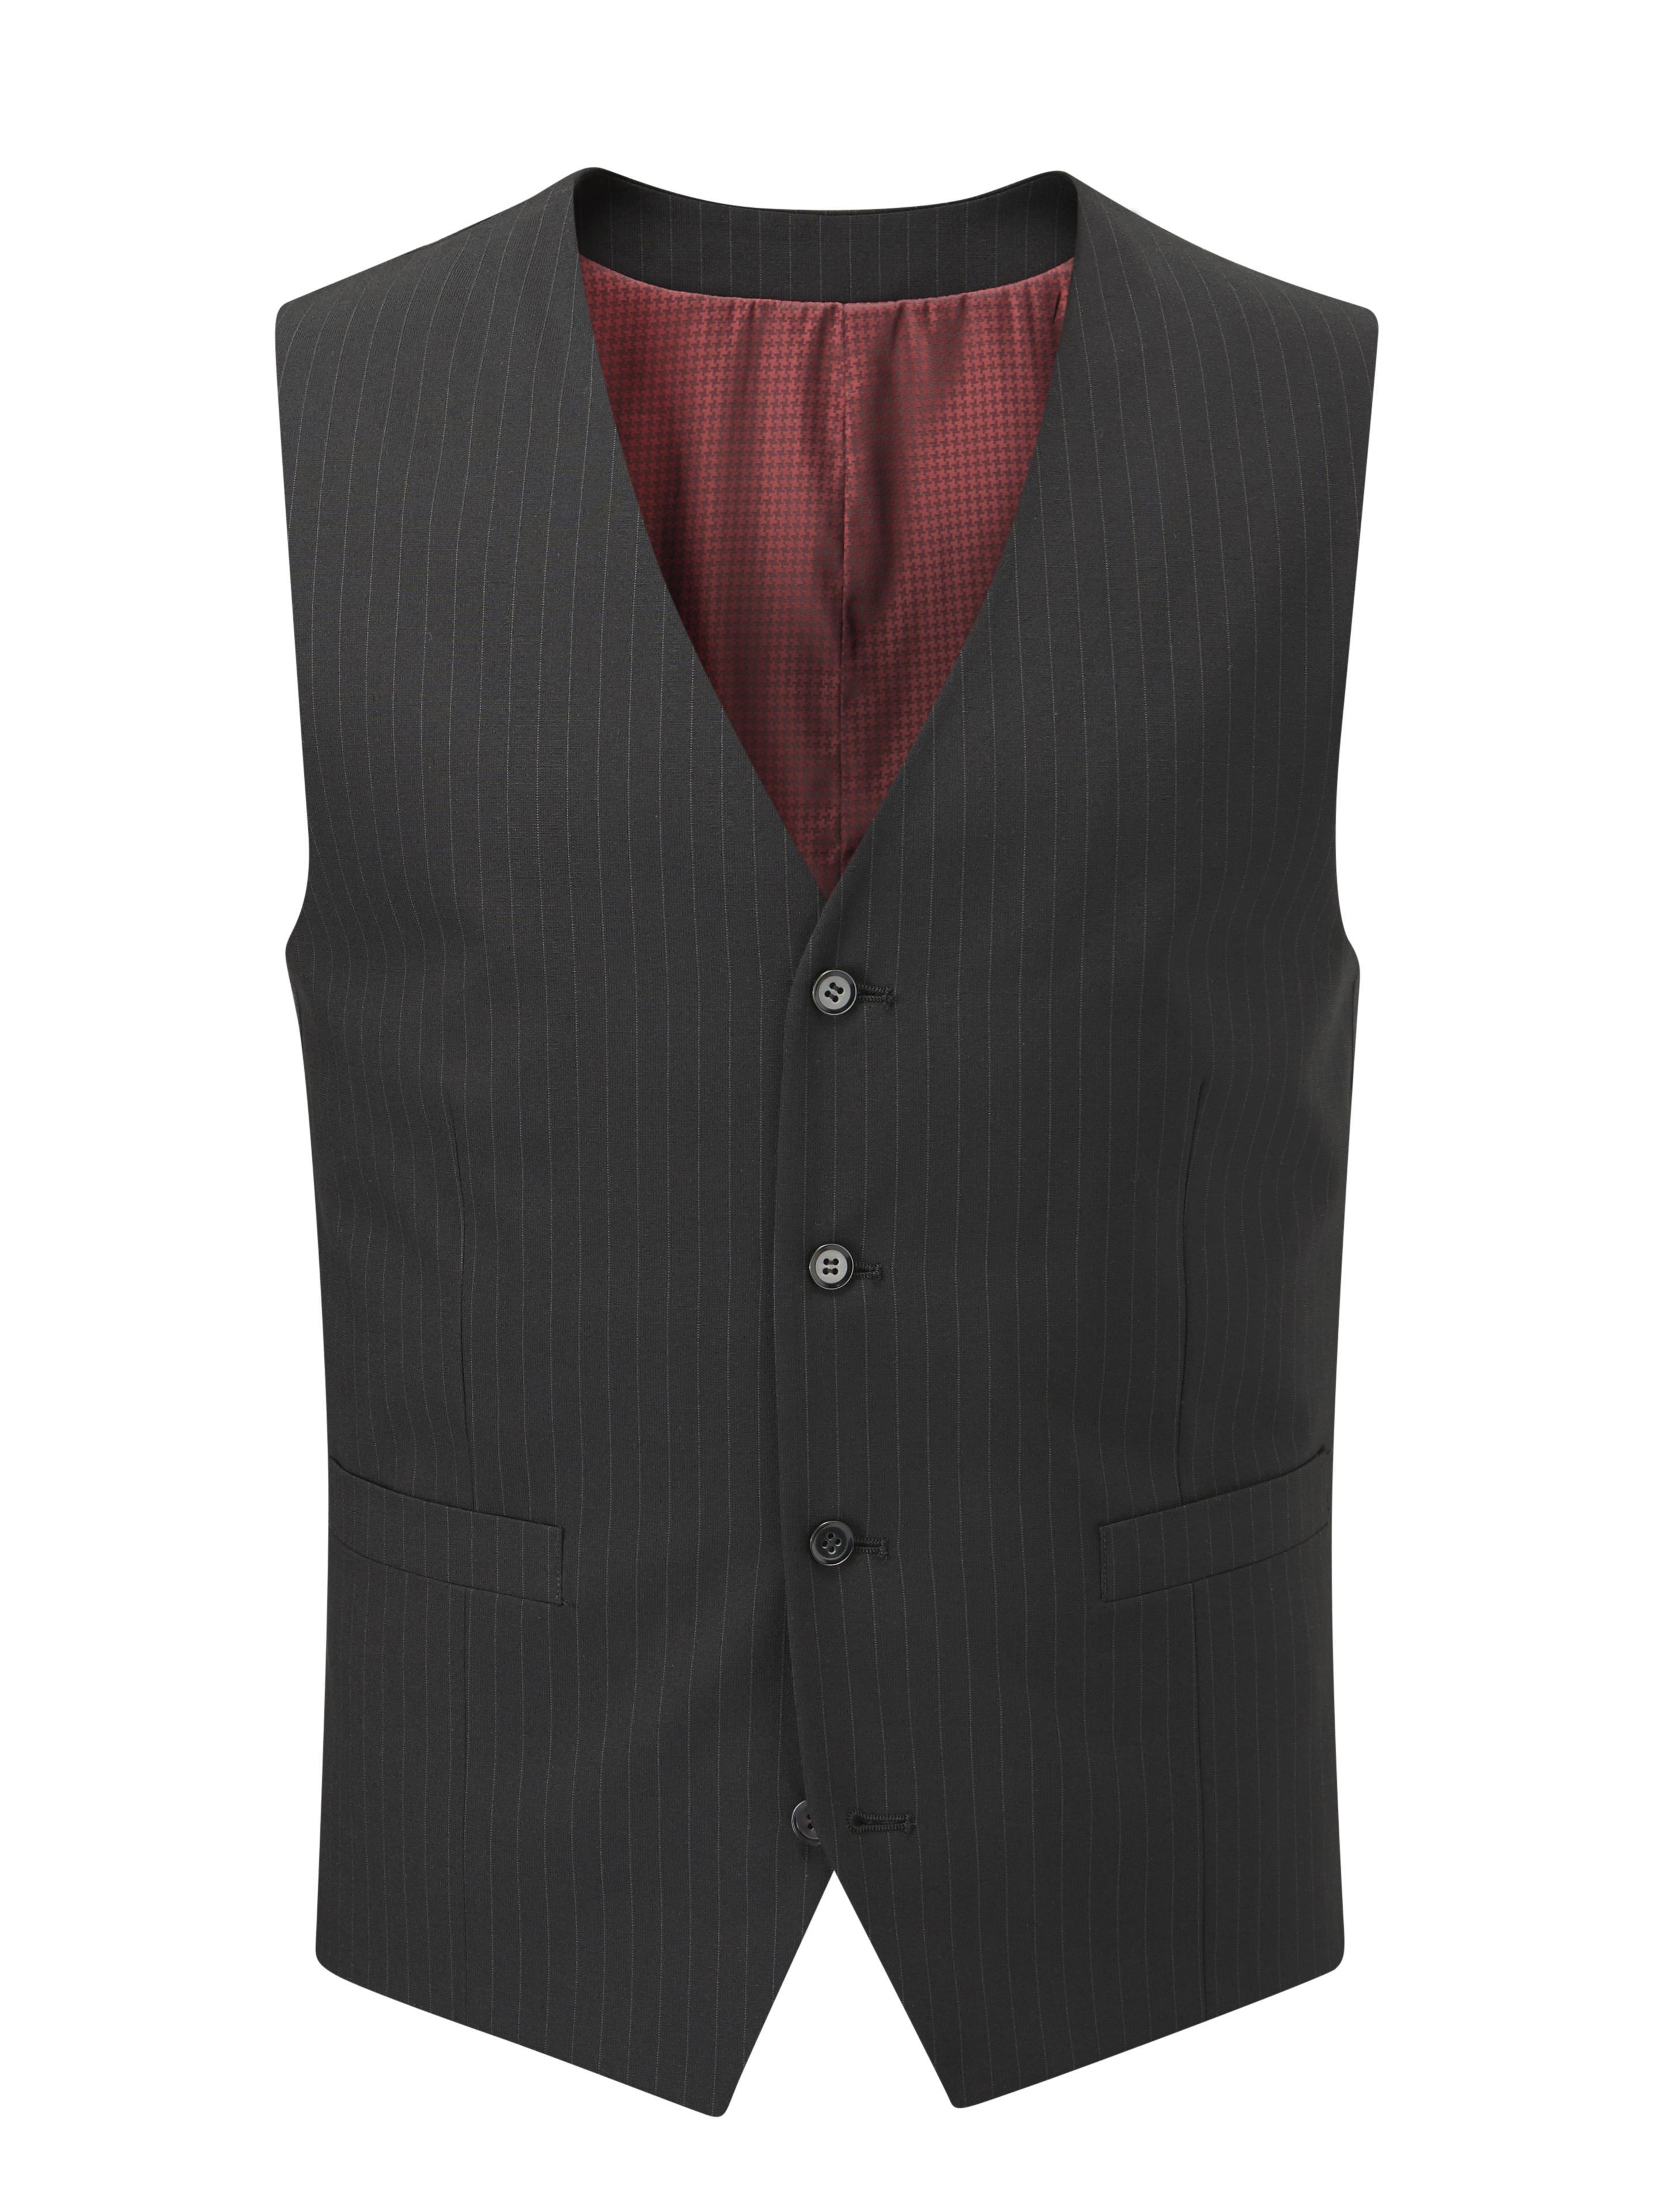 mm1329-darwin-black-stripe-waistcoat-0.jpg